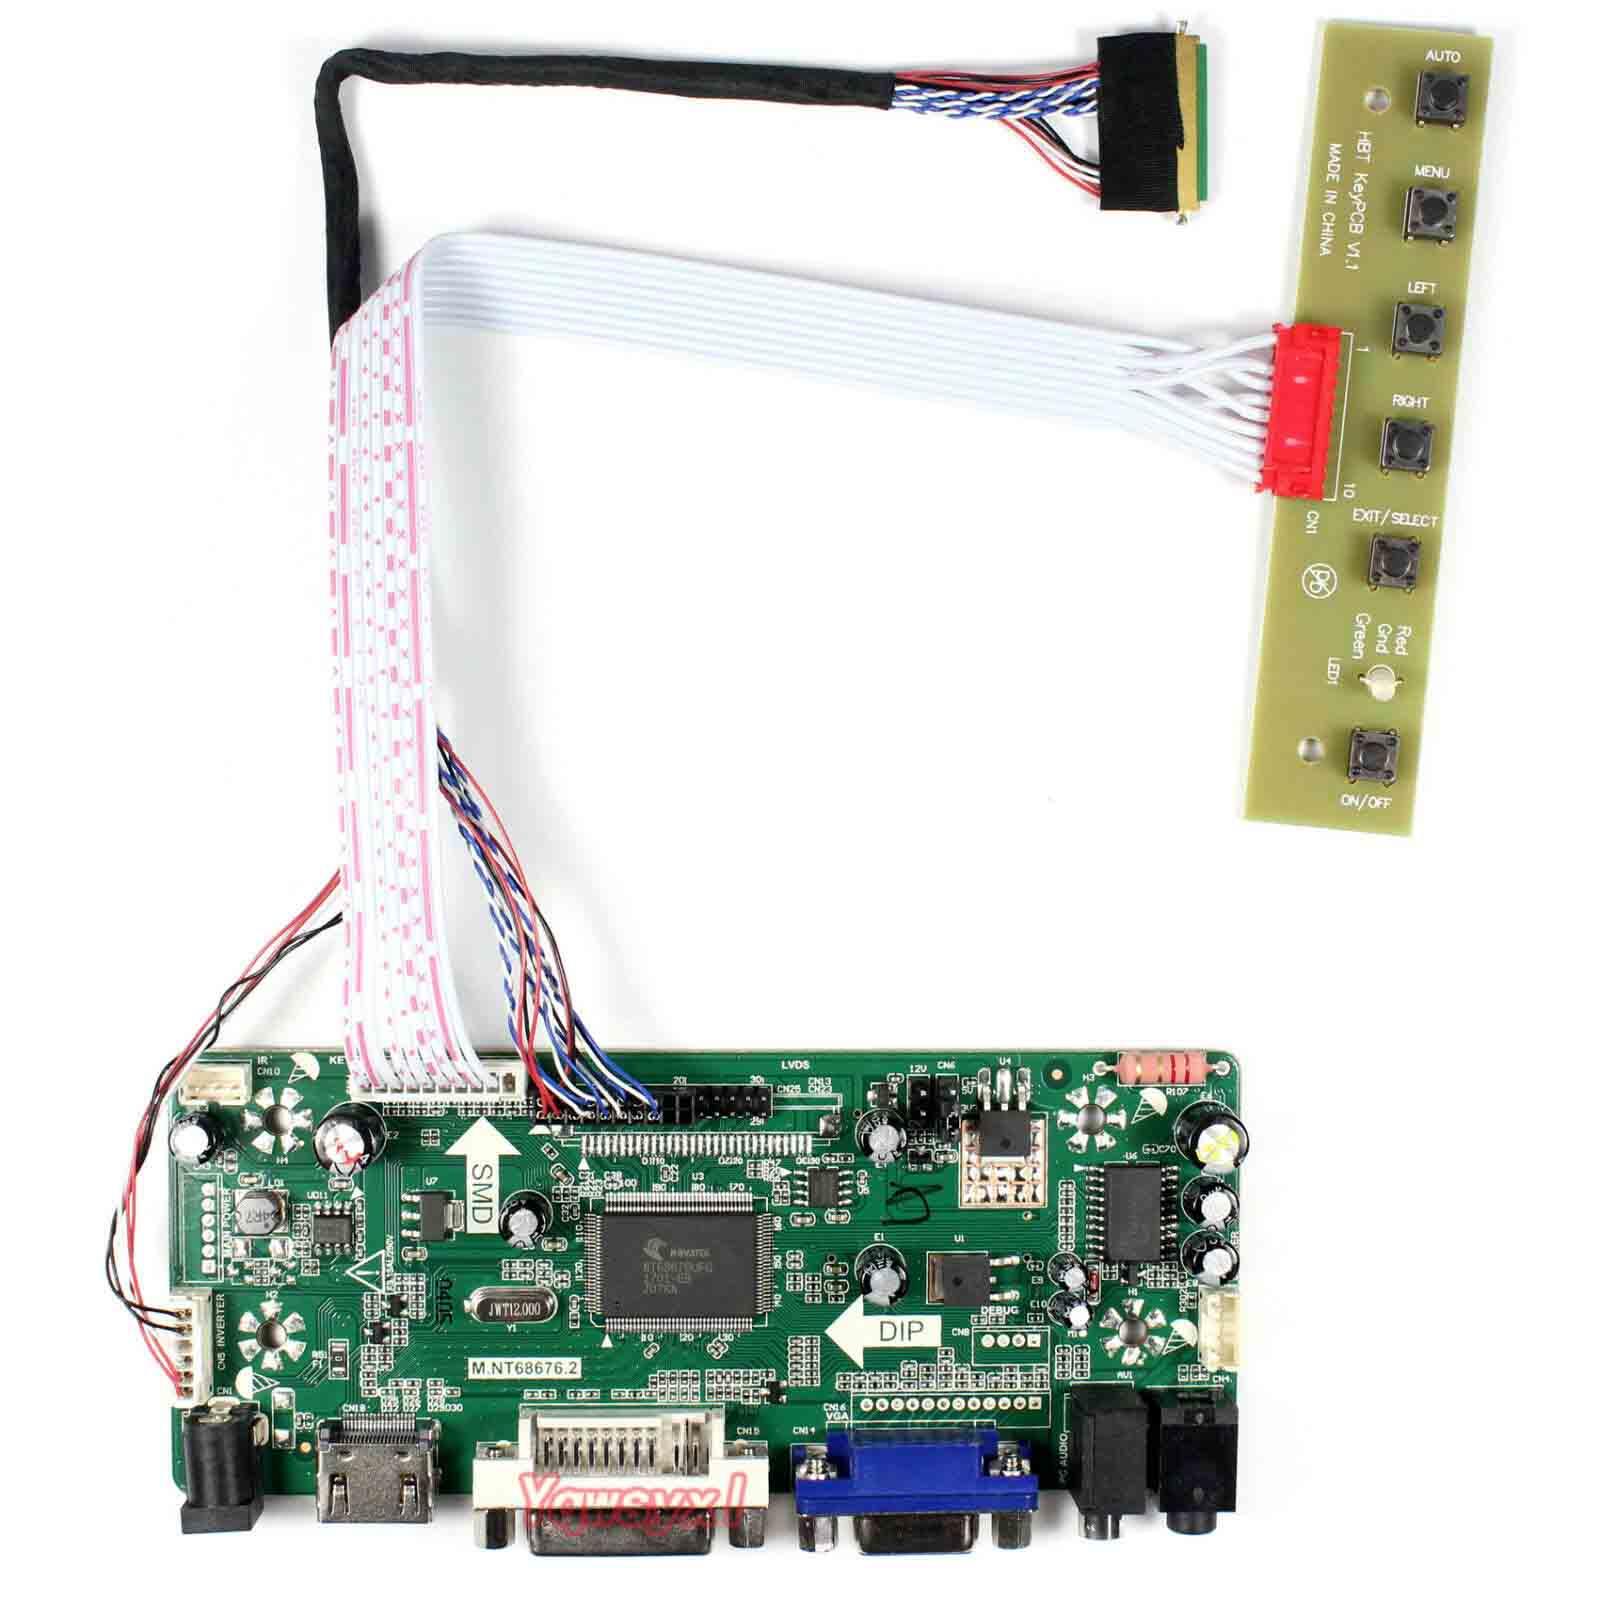 Yqwsyxl Control Board Monitor Kit For LP156WHB-TLC1  LP156WHB-TLC2  HDMI+DVI+VGA LCD LED Screen Controller Board Driver